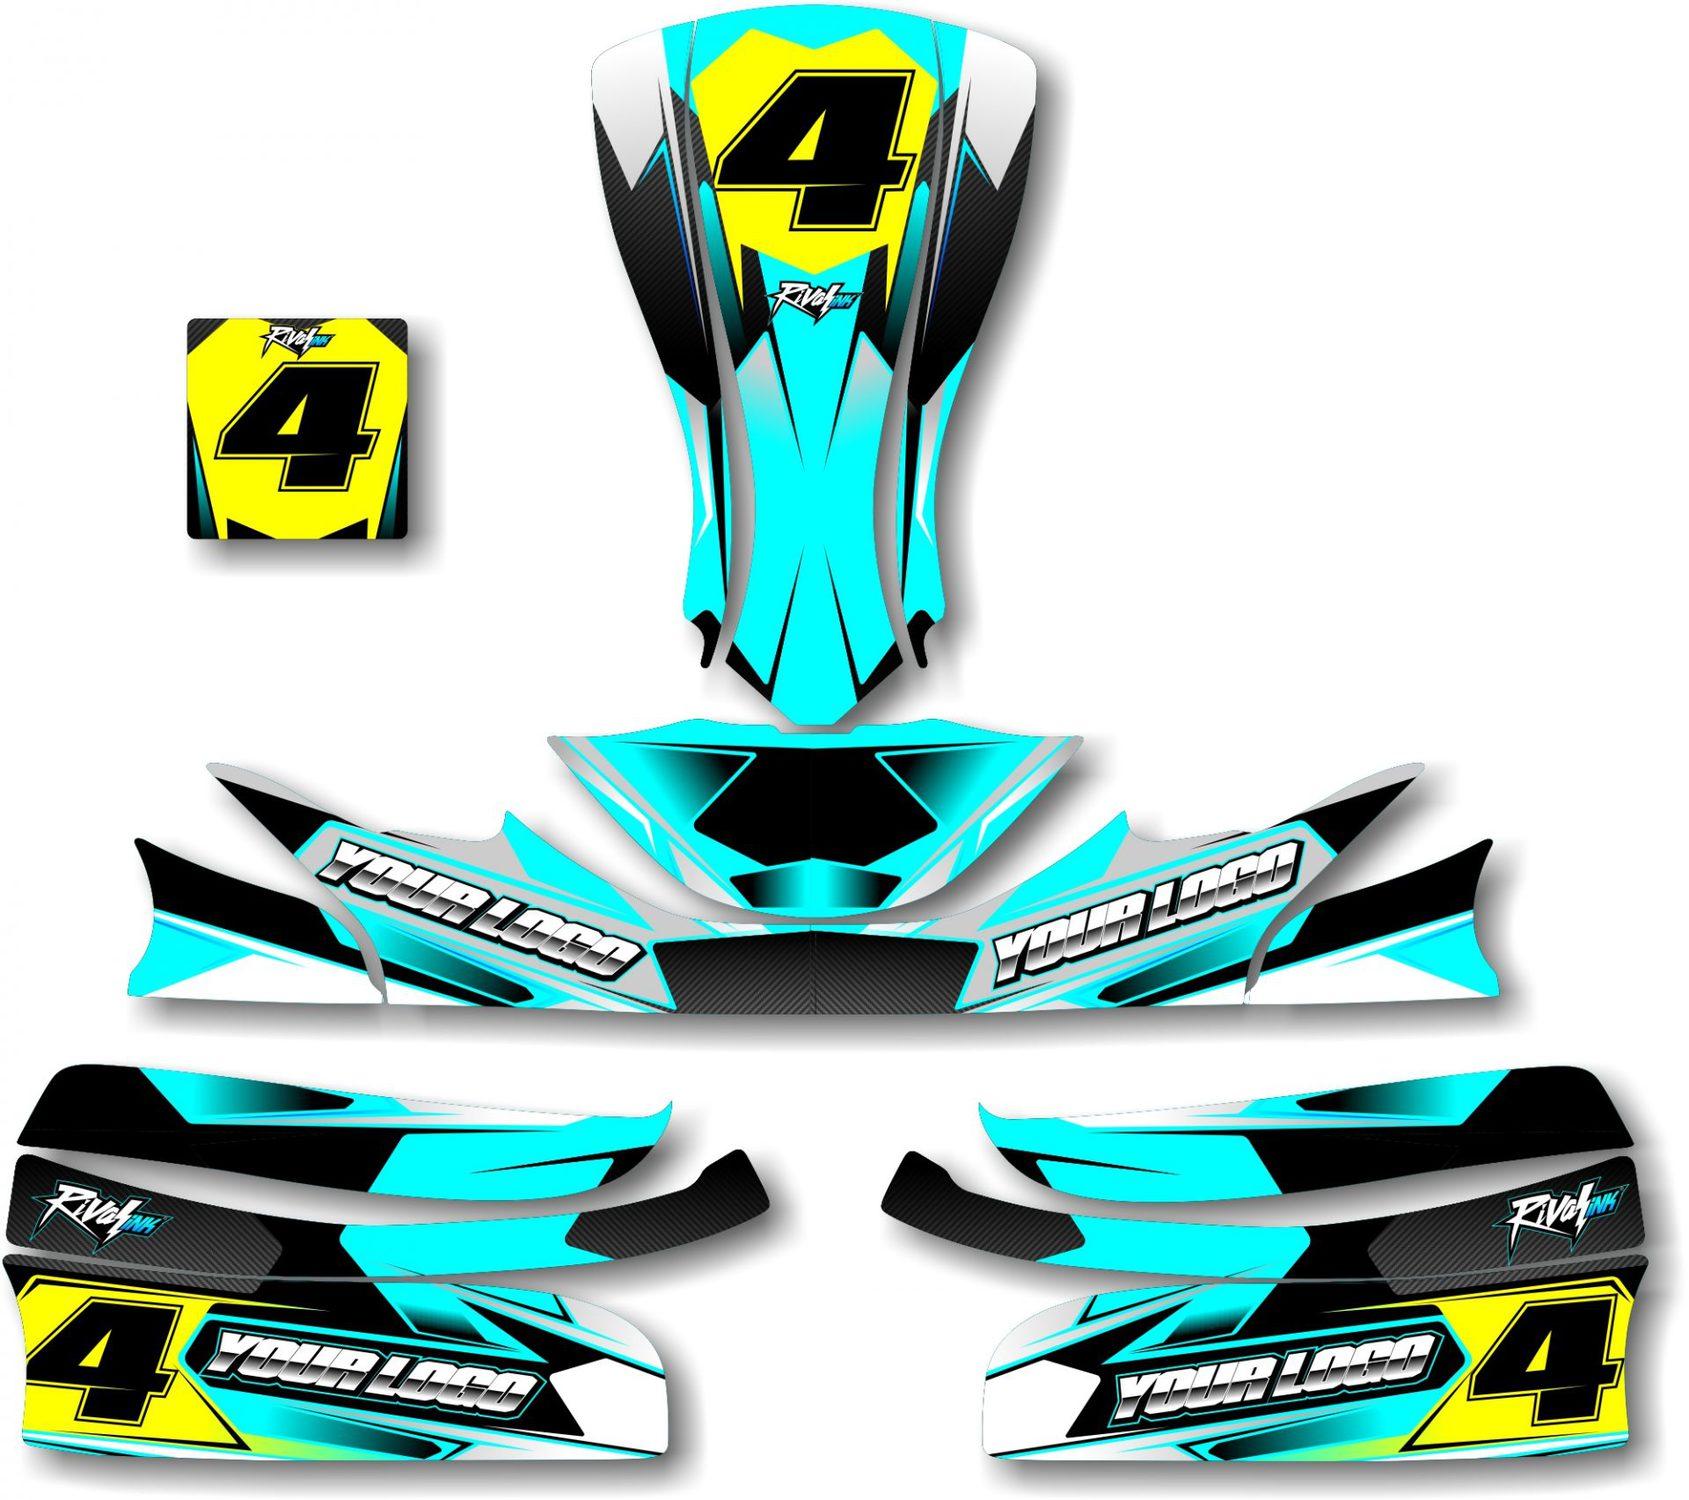 Carbon Kart Kit Cyan Rival Ink Design Co